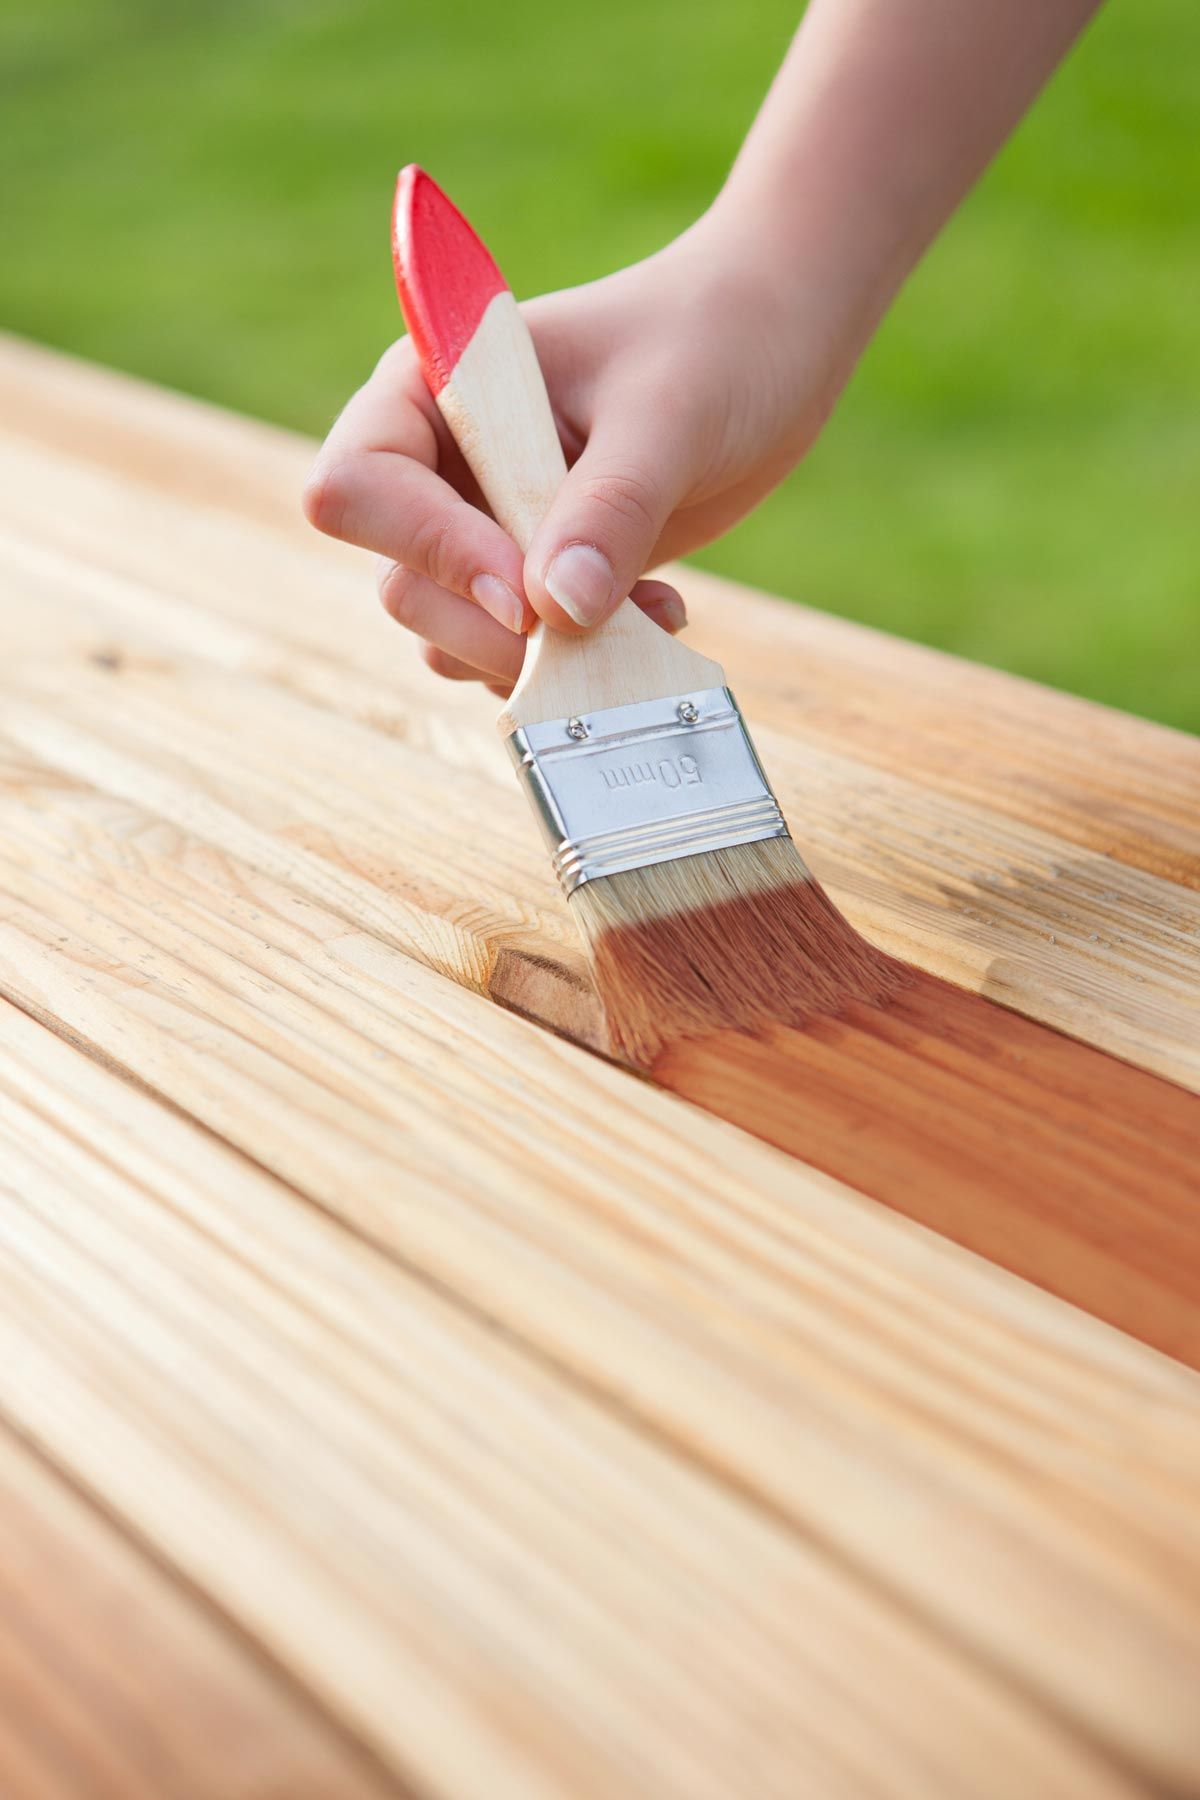 C mo barnizar la madera hogarmania for Como barnizar madera